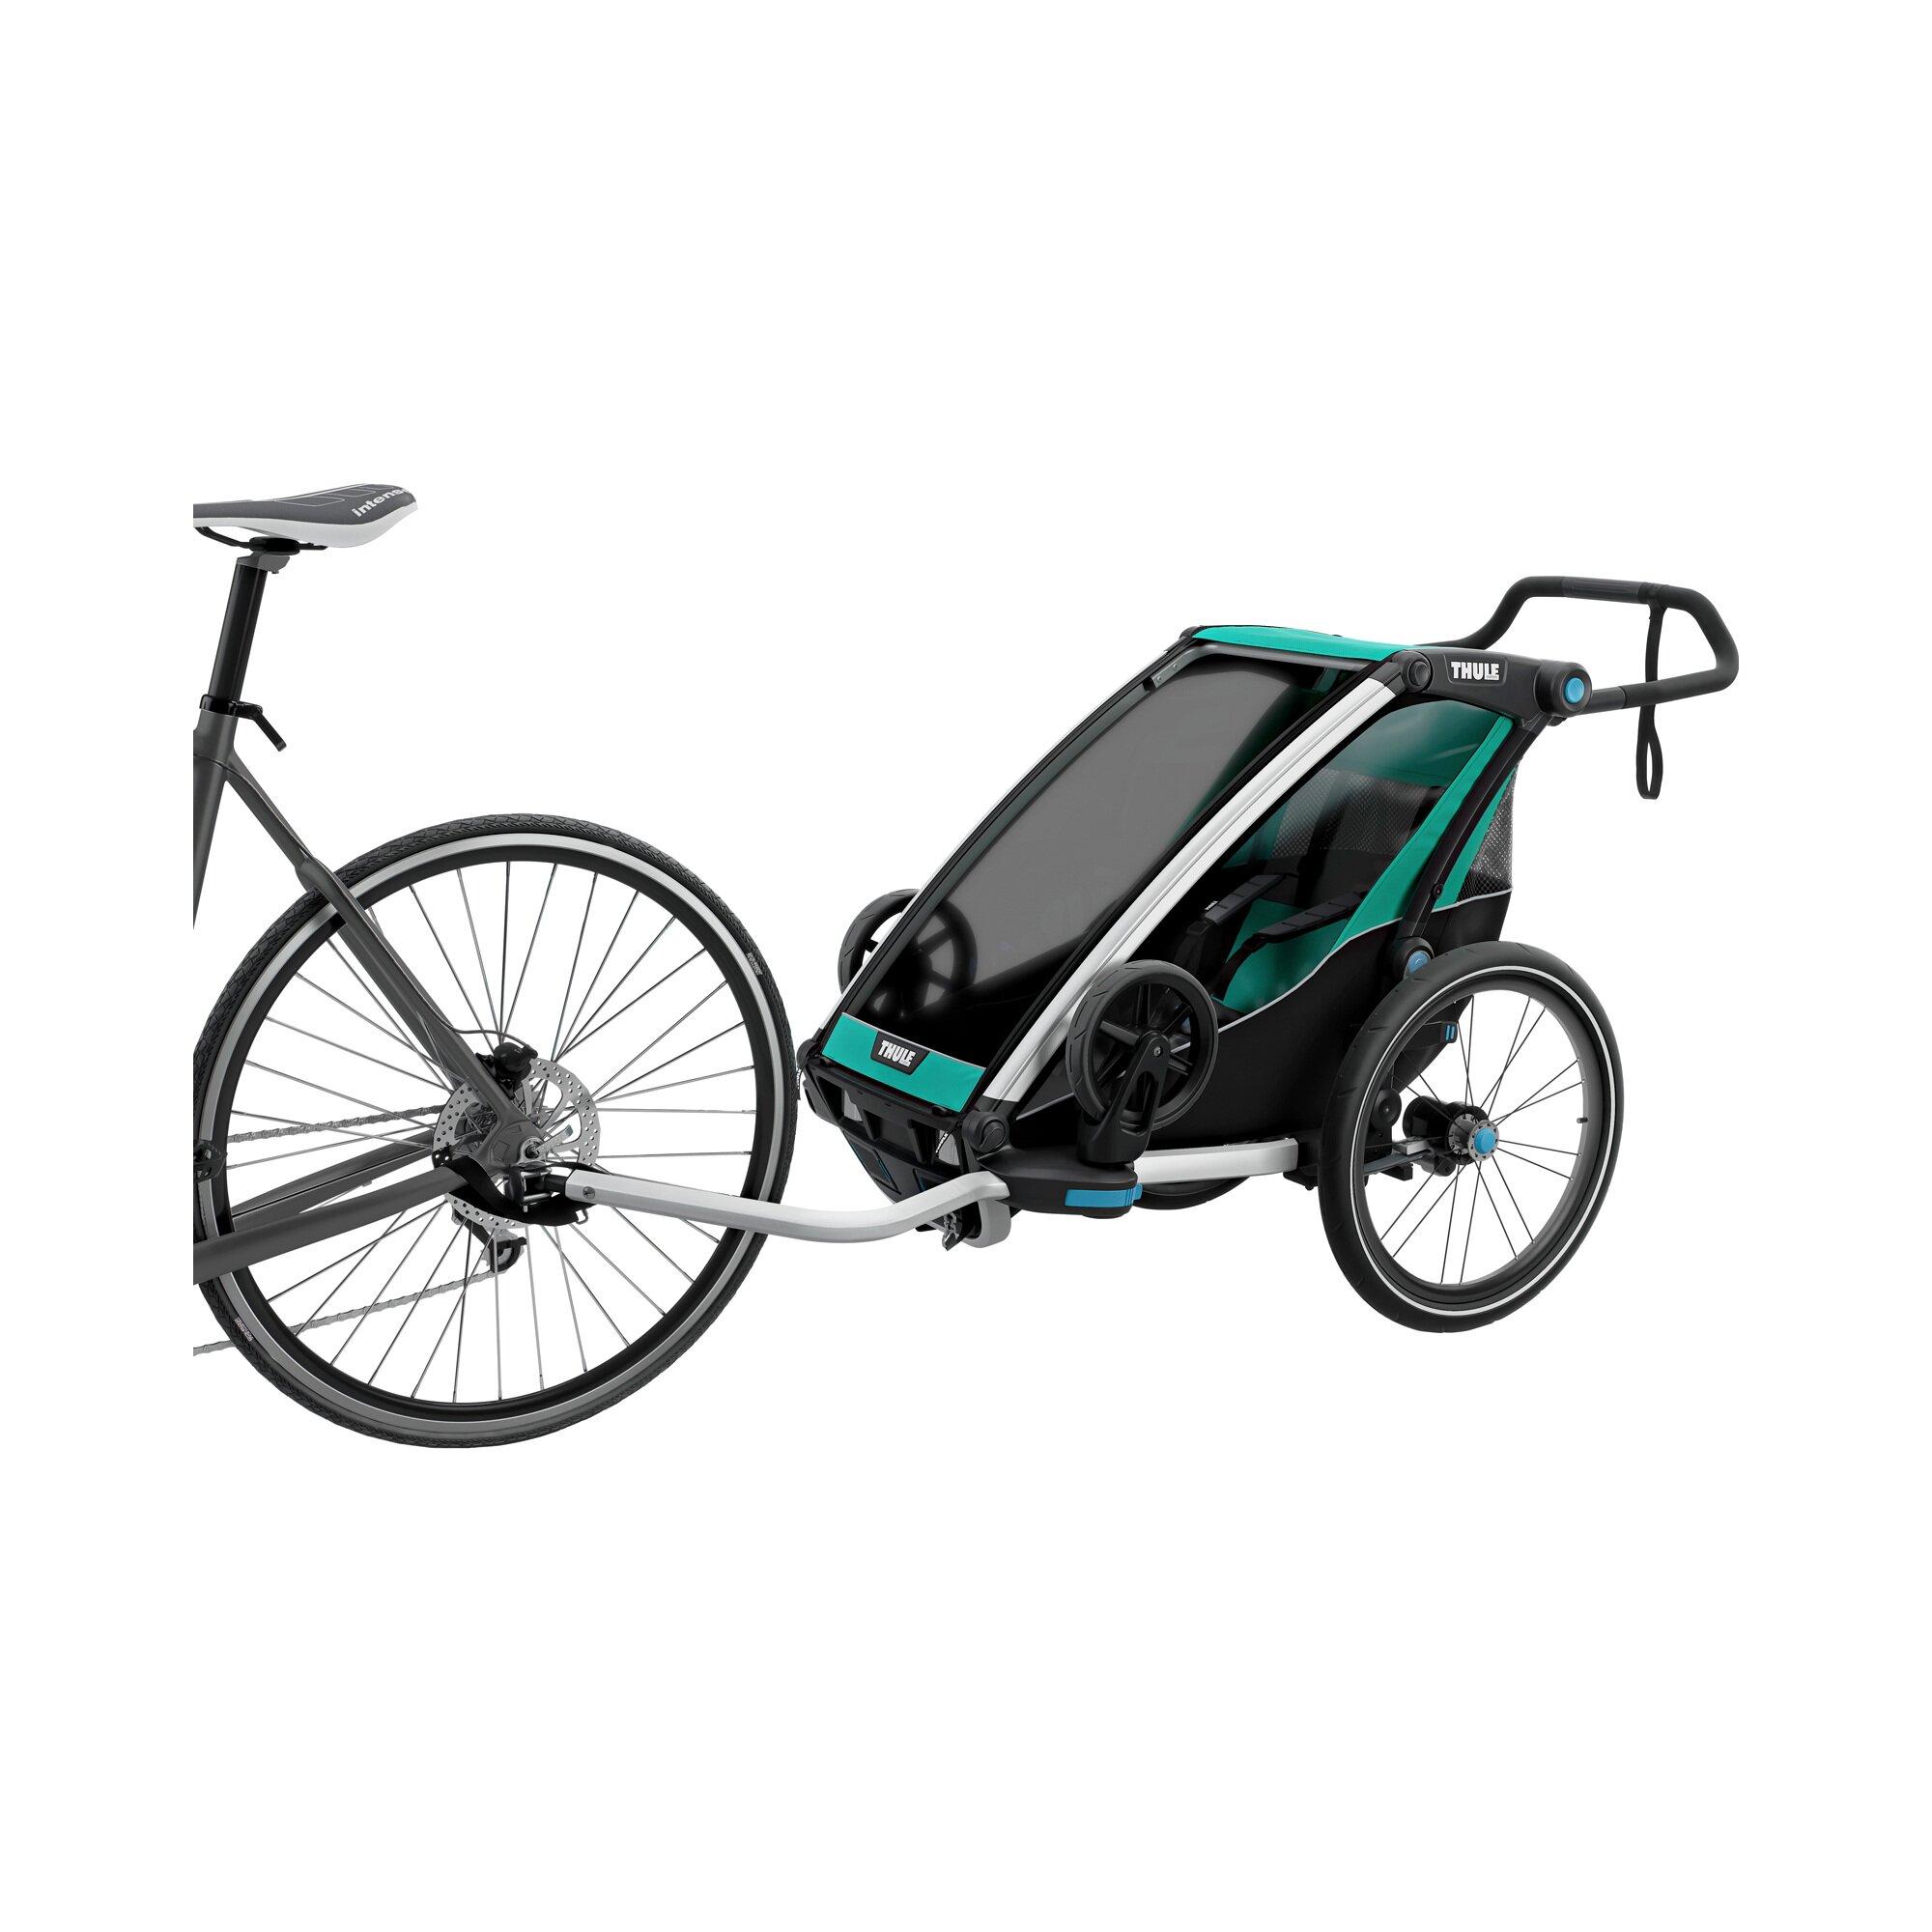 thule-chariot-lite1-fahrradanhanger